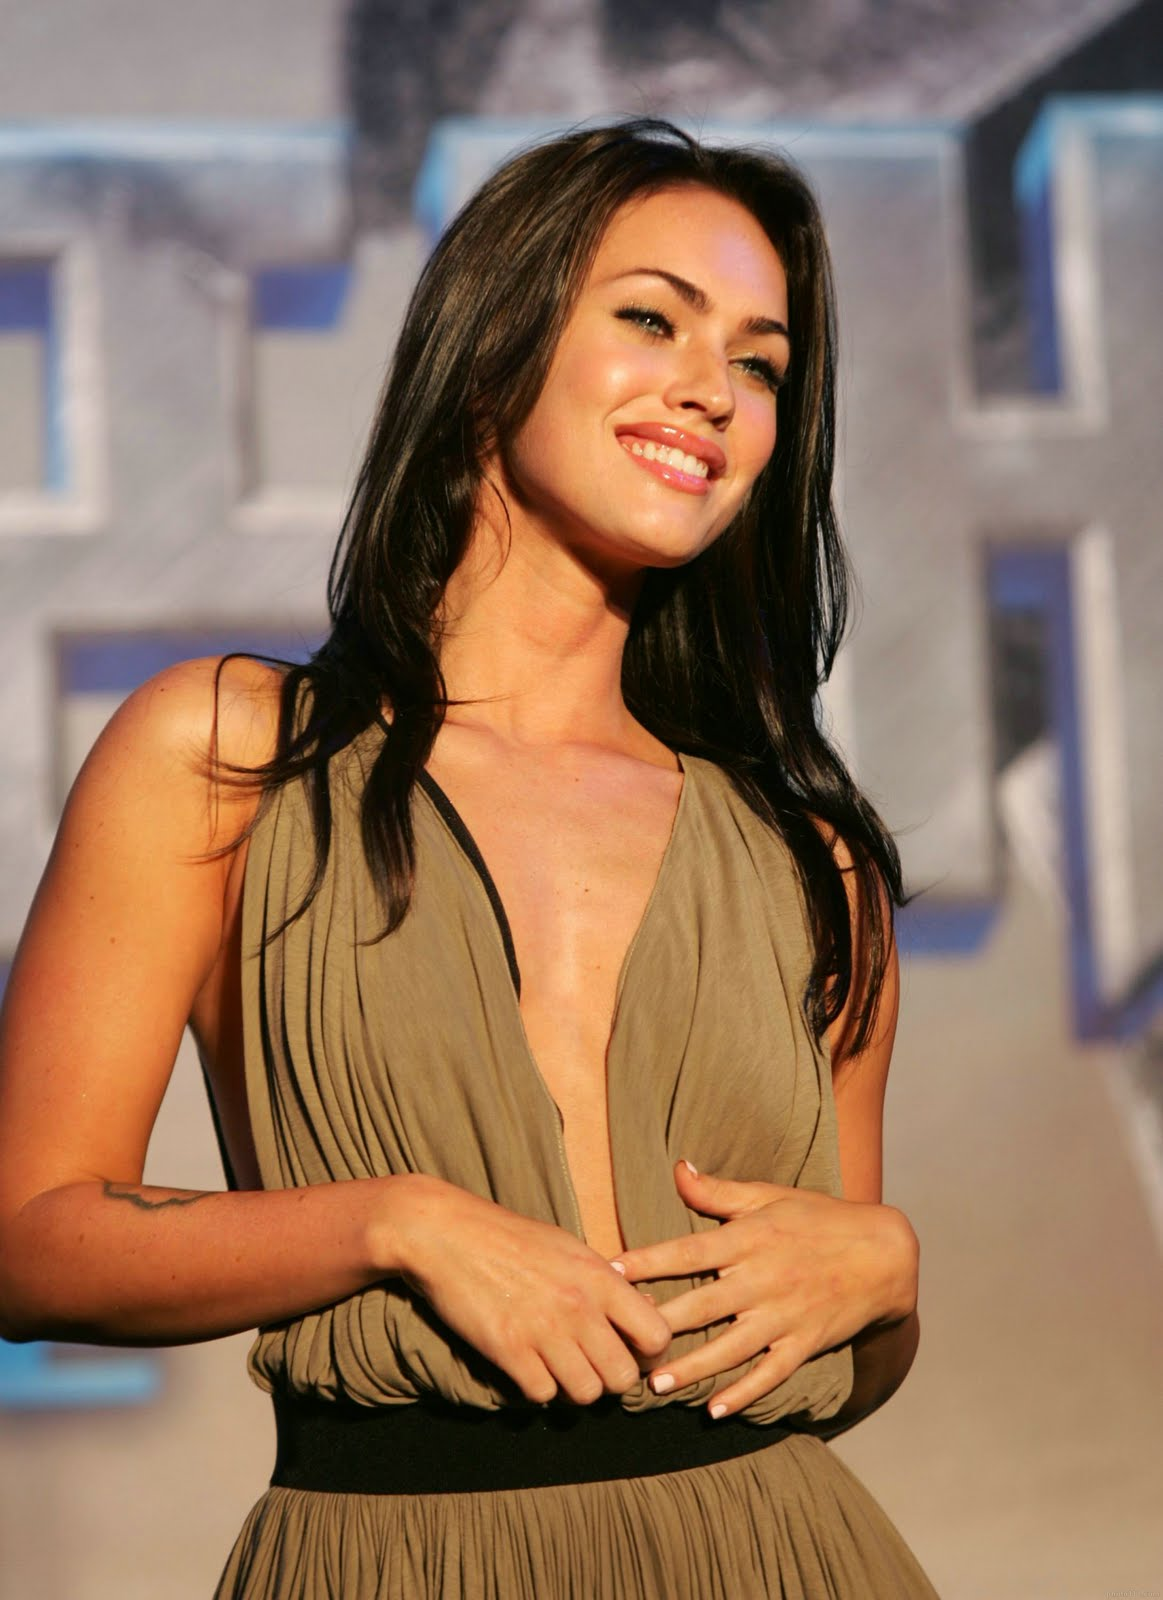 Hot Actress Megan Fox - Girls Idols Wallpapers And Biography-2842